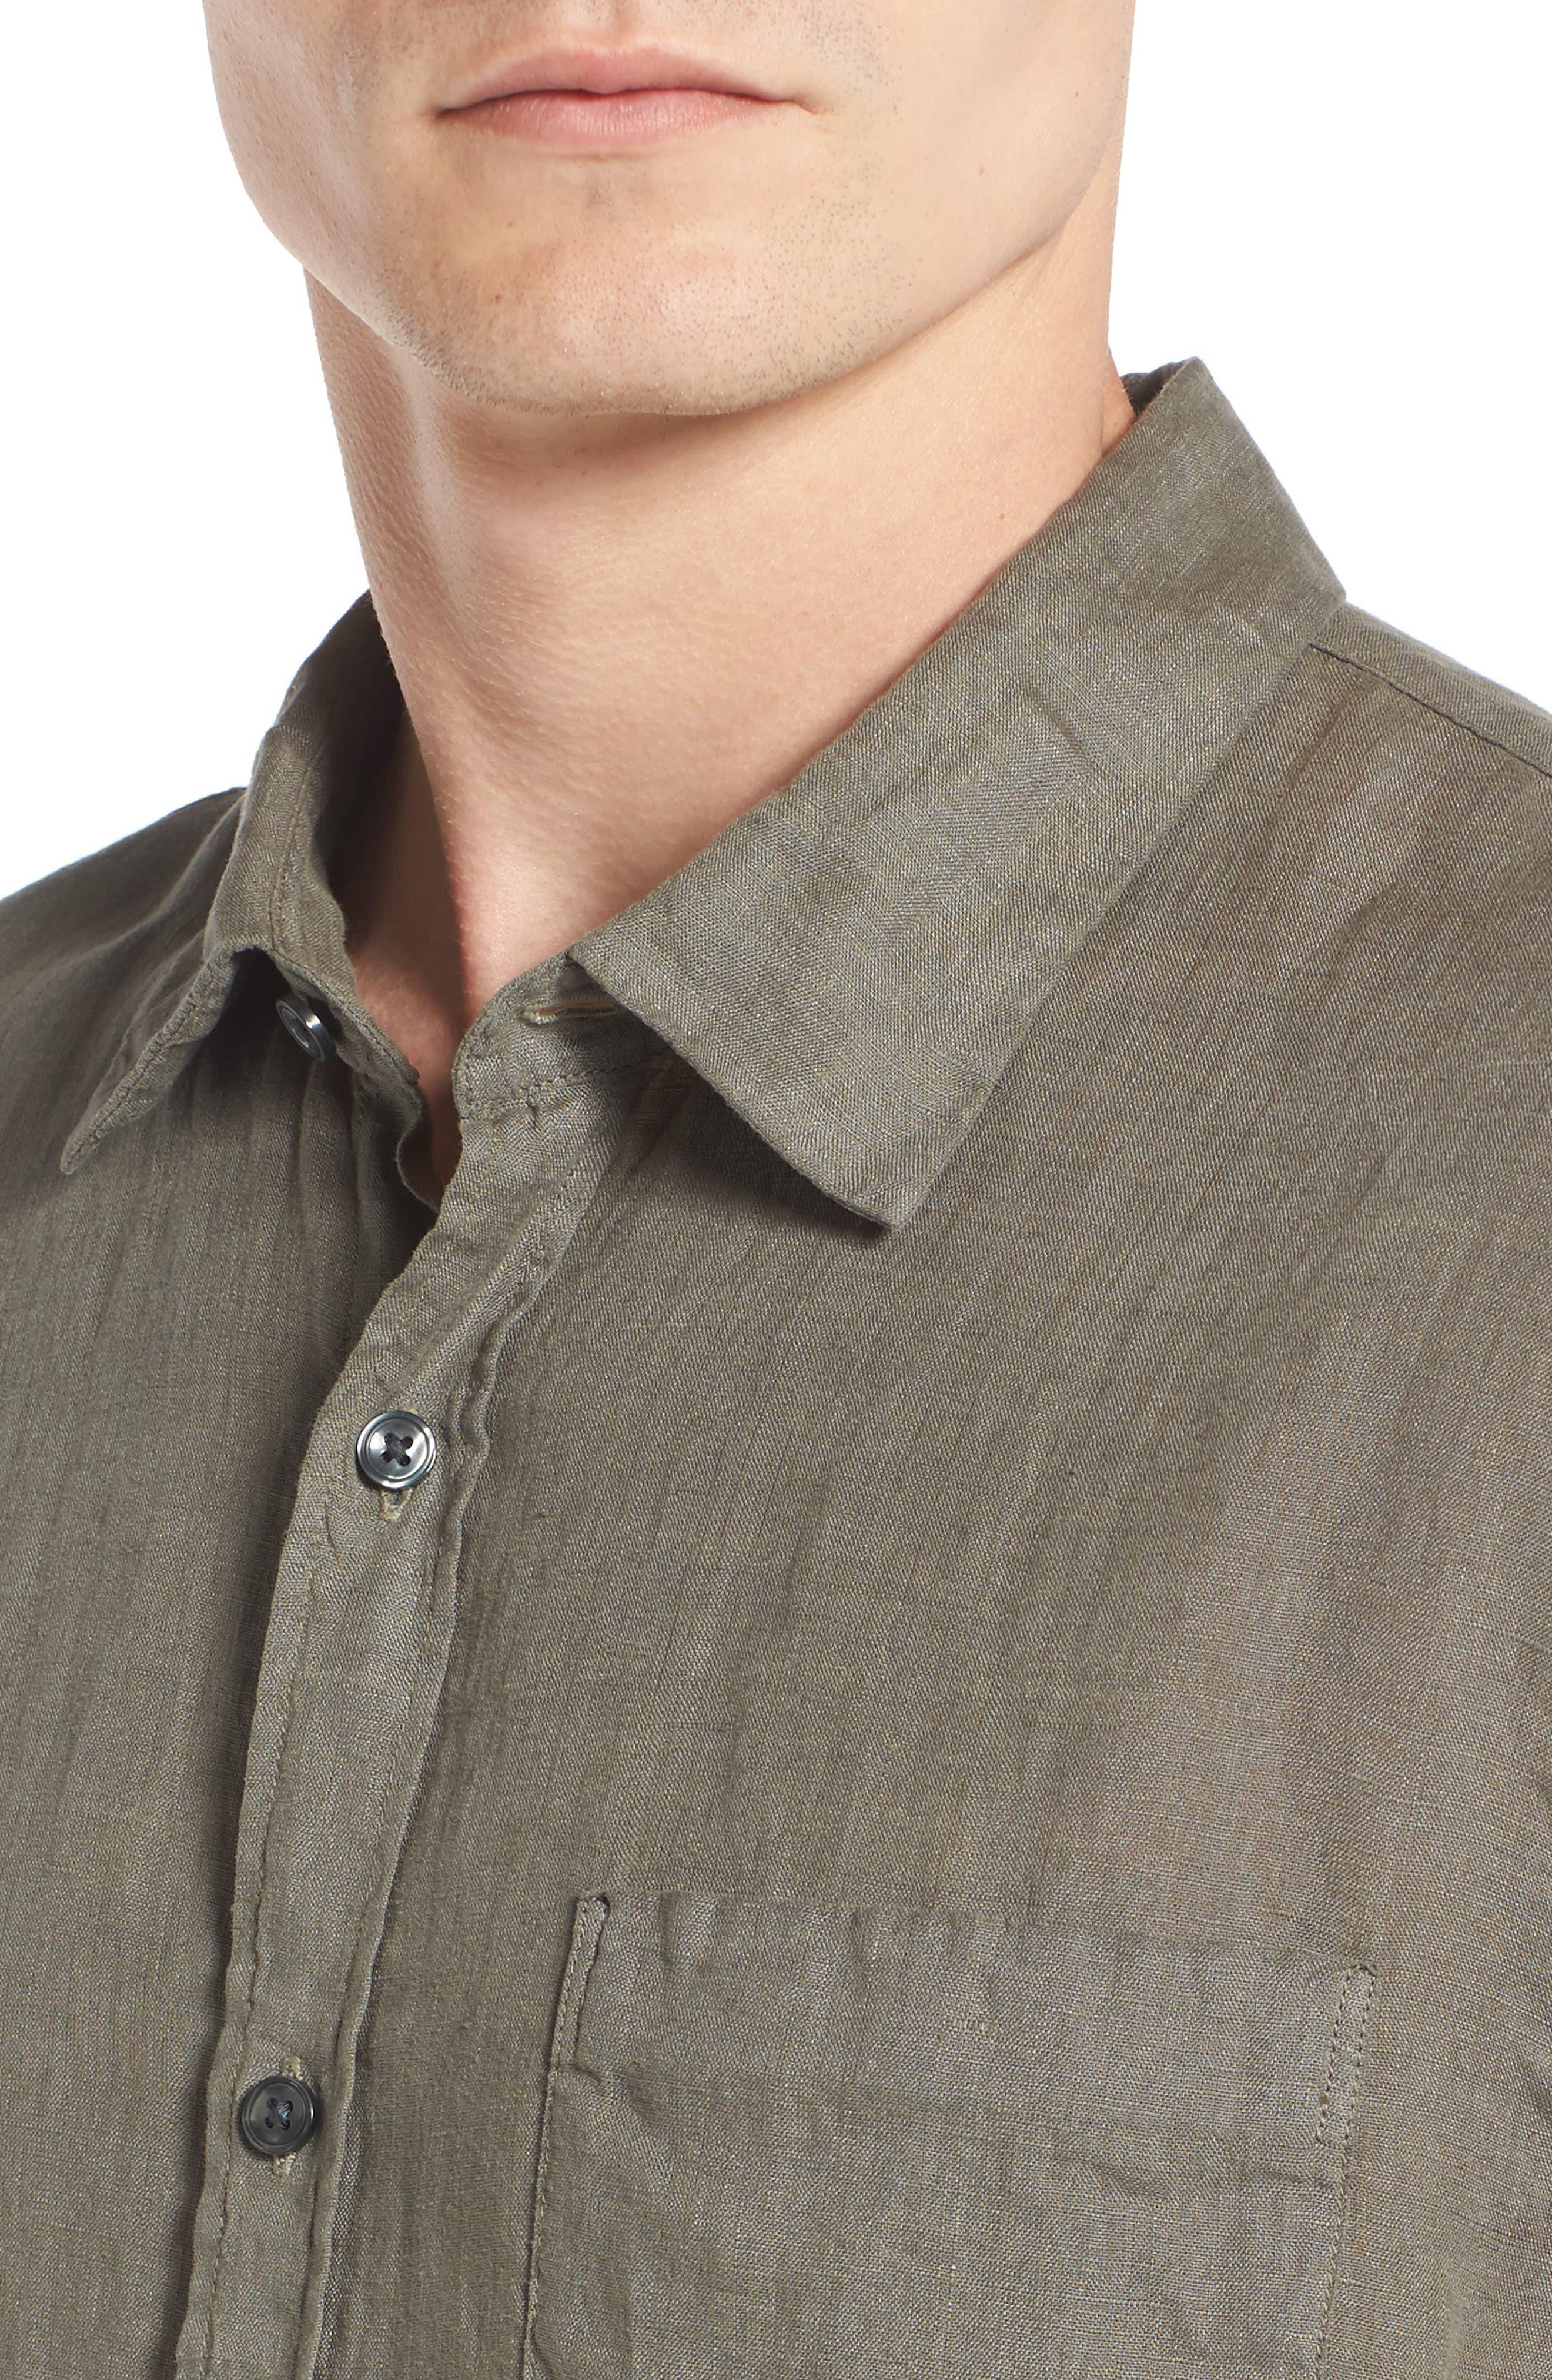 Trim Fit Linen Sport Shirt,                             Alternate thumbnail 4, color,                             Desert Green